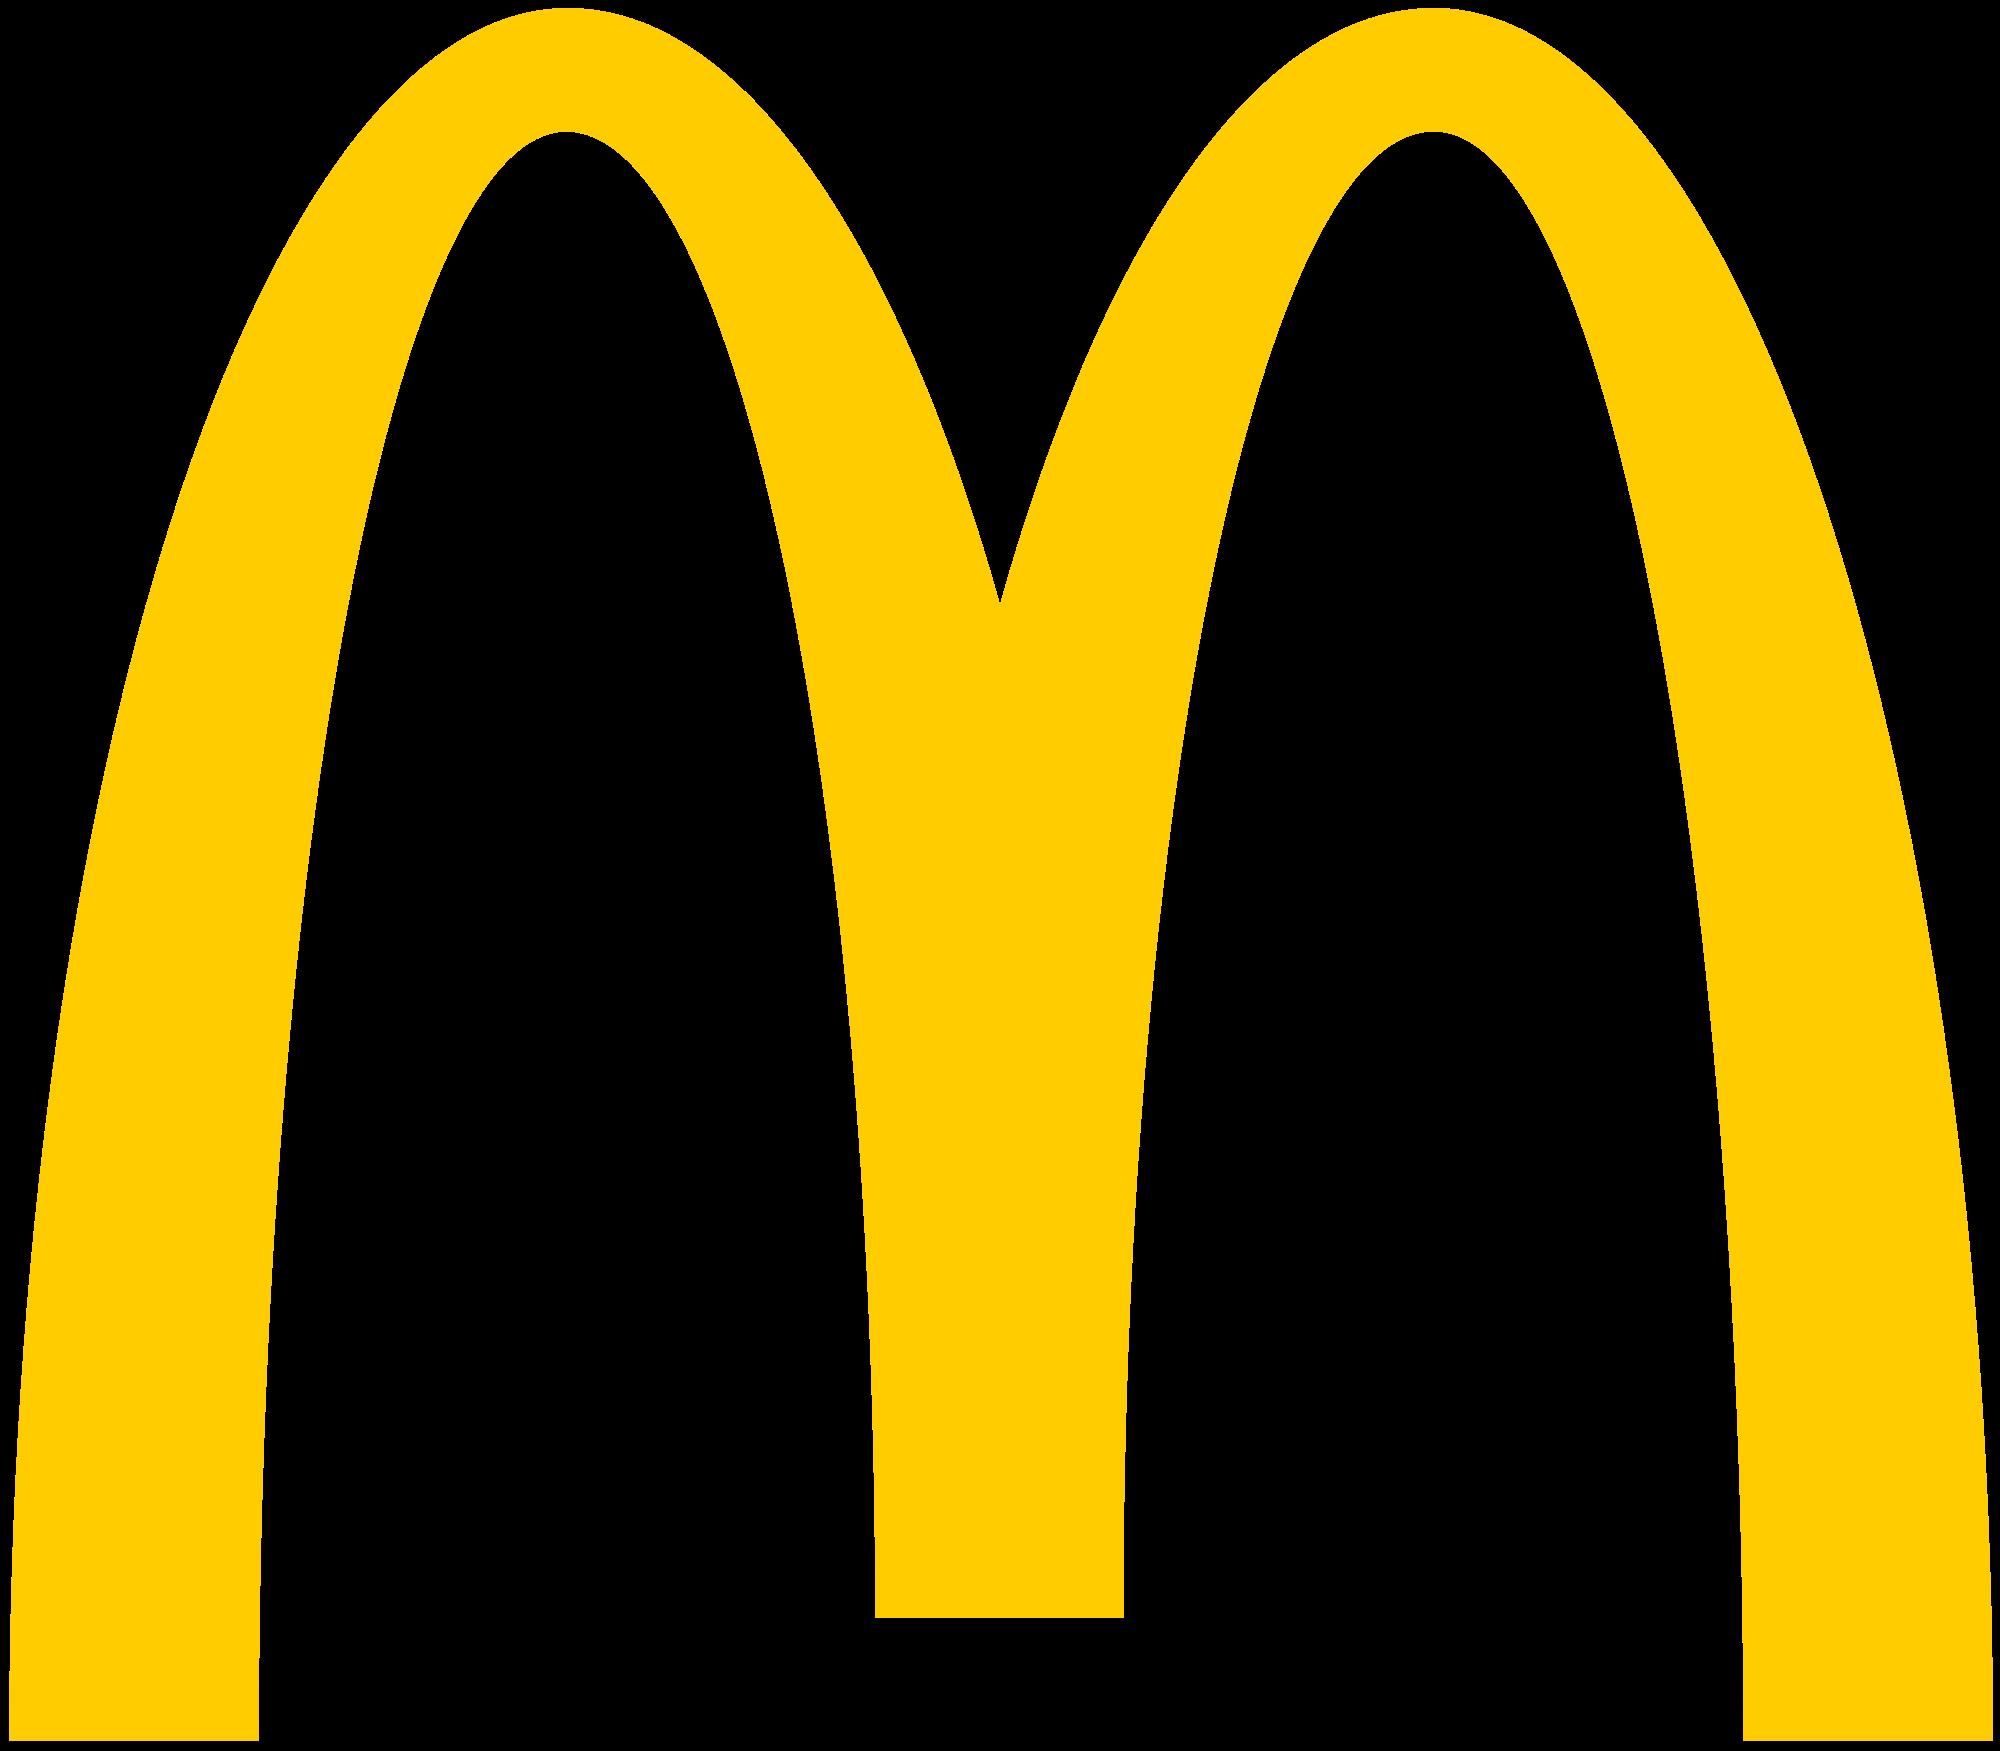 2000px-McDonald's_Golden_Arches.png